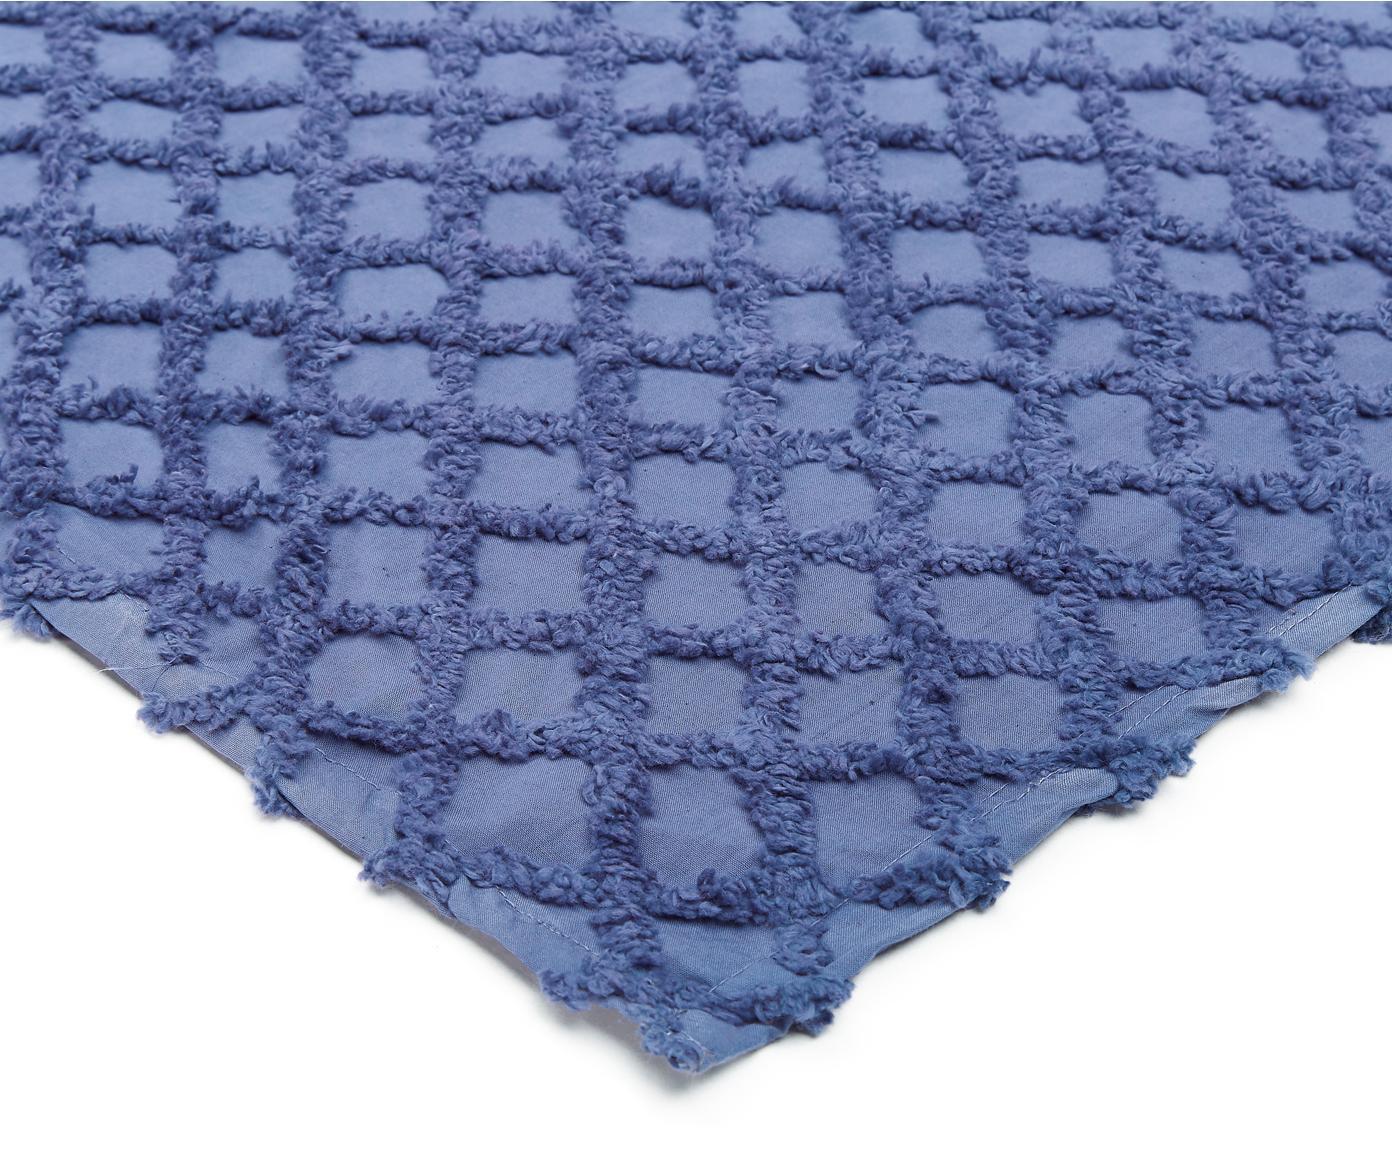 Tagesdecke Royal mit Hoch-Tief-Muster, 100% Baumwolle, Blau, 180 x 260 cm